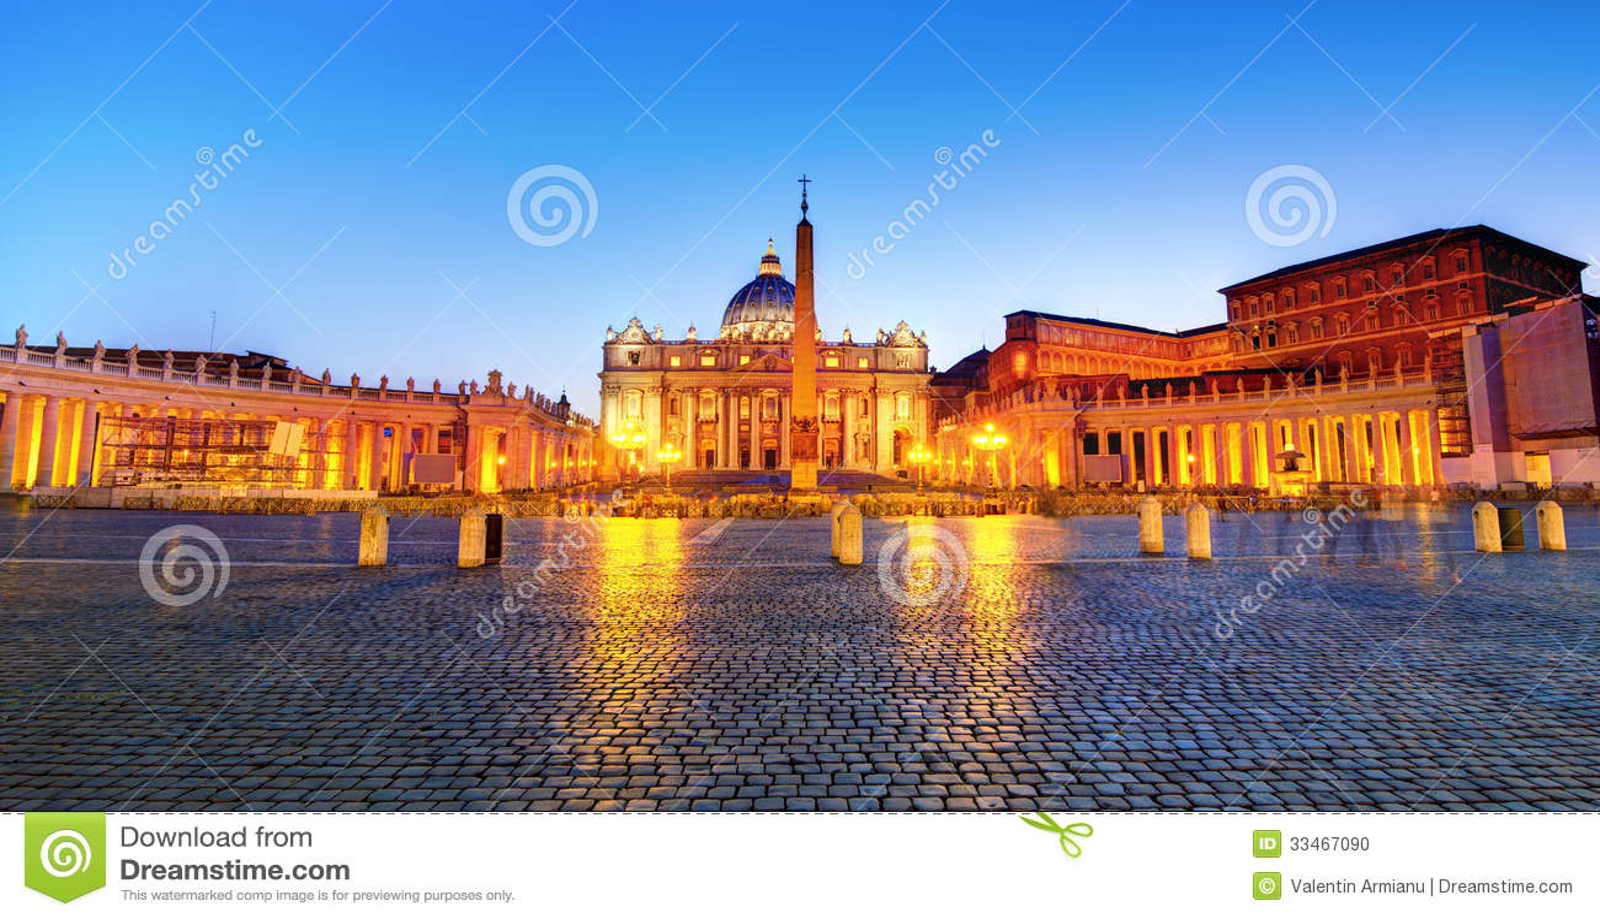 St. Peter s square night